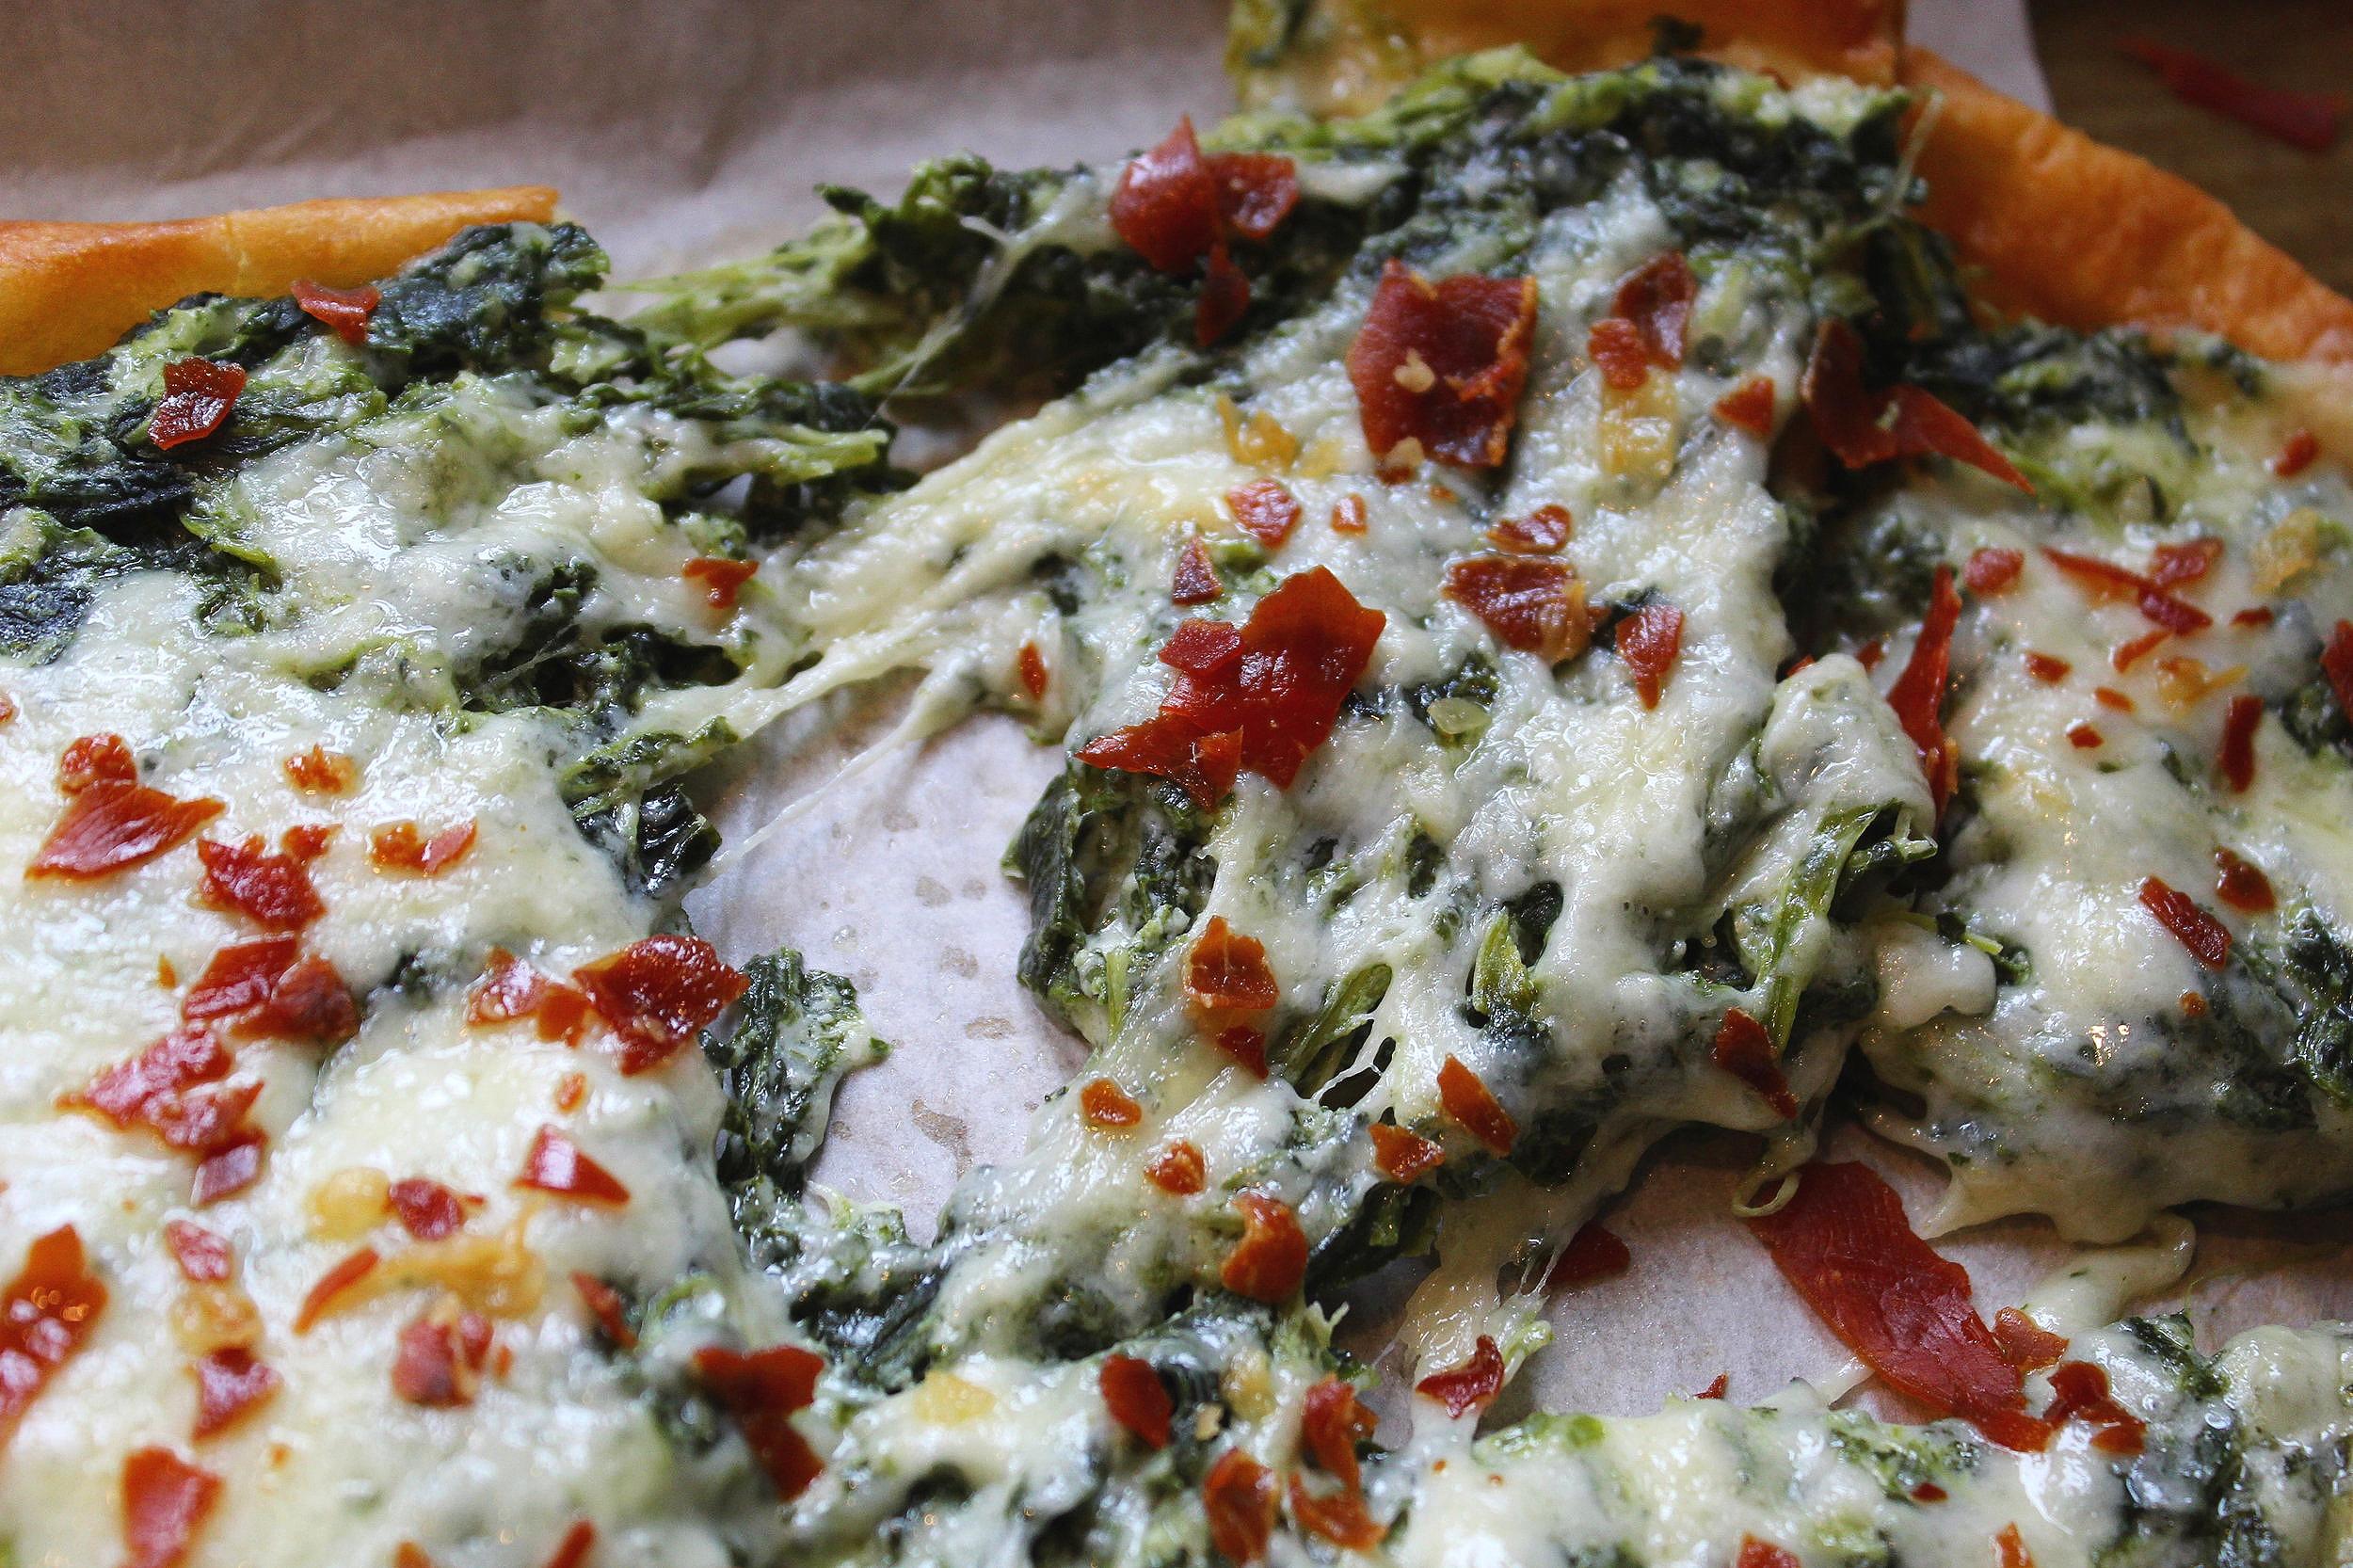 - spinach dip flatbread